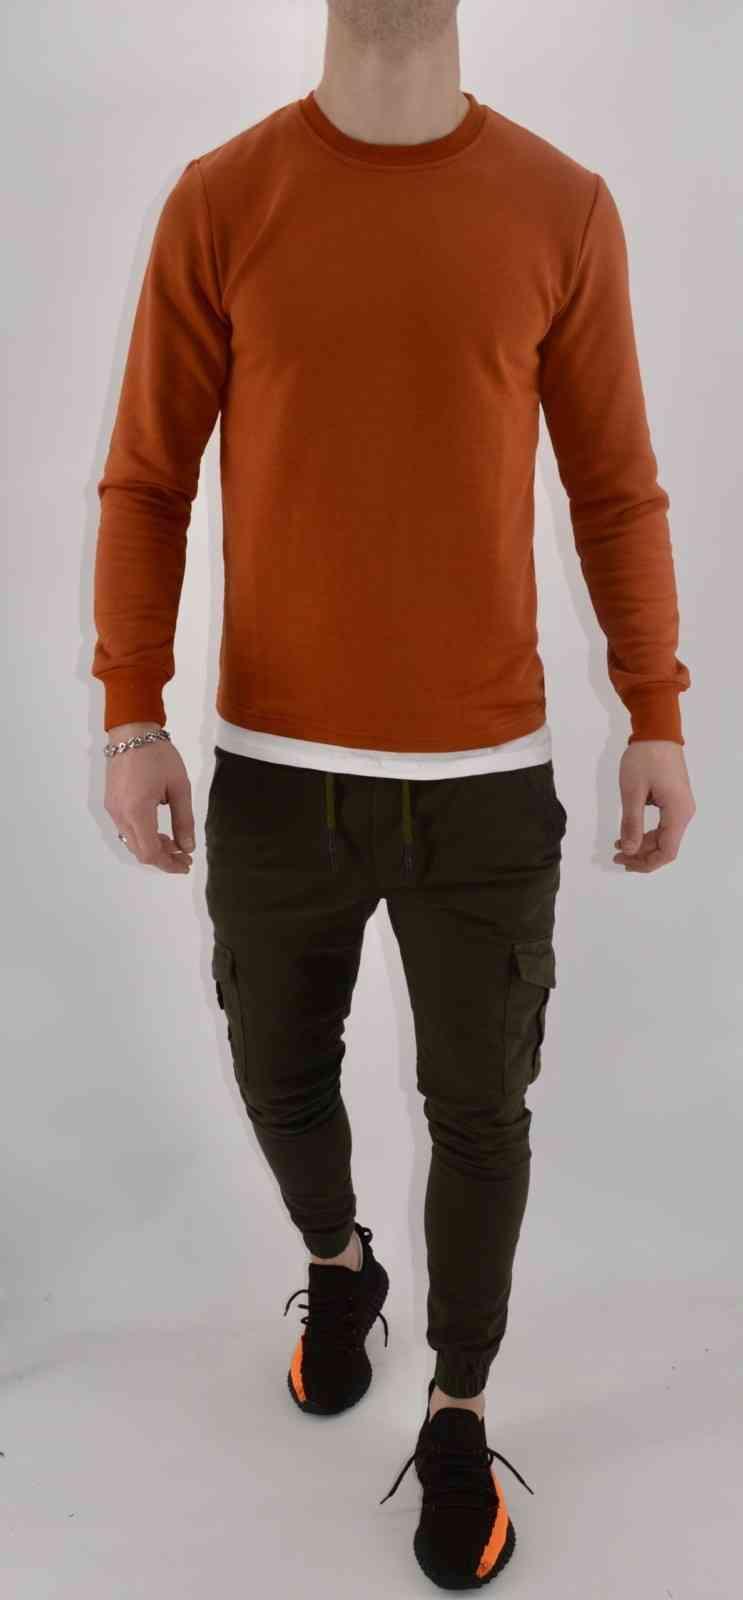 tenue pour homme, pull mode urbaine